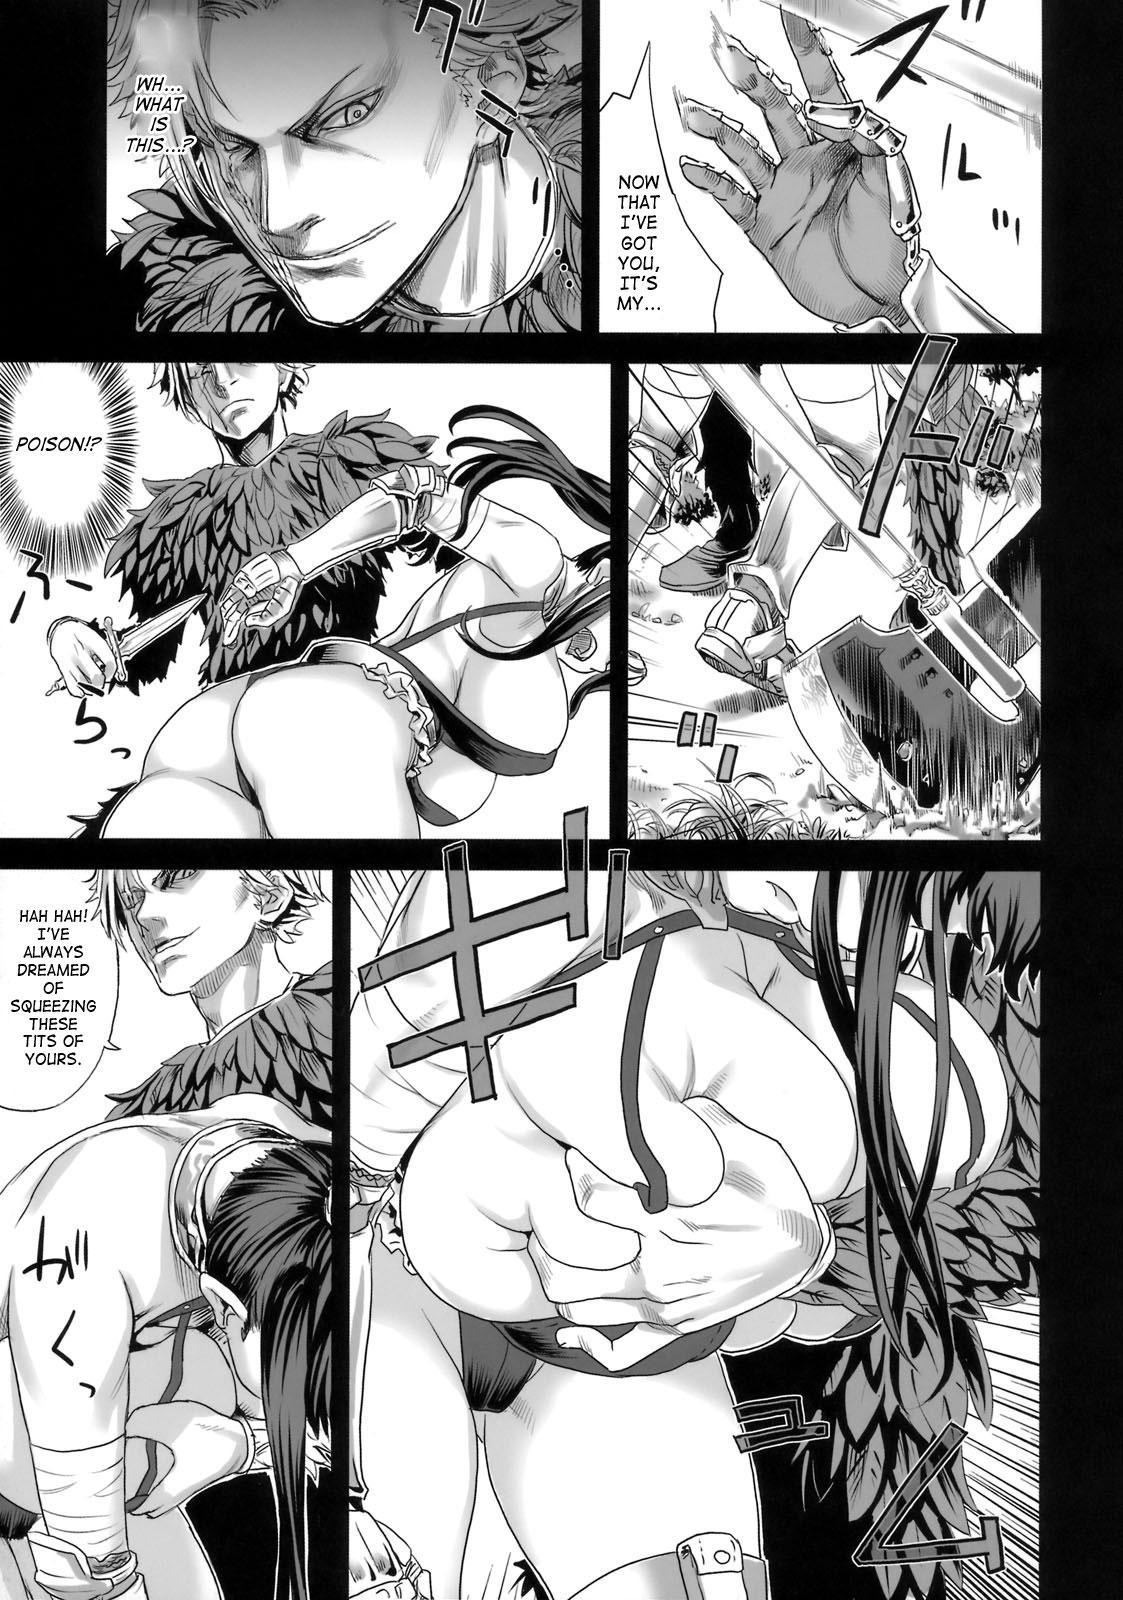 (C76) [Fatalpulse (Asanagi)] Victim Girls 7 - Jaku Niku Kyoushoku Dog-eat-Bitch (Fantasy Earth Zero) [English] [SaHa] 5